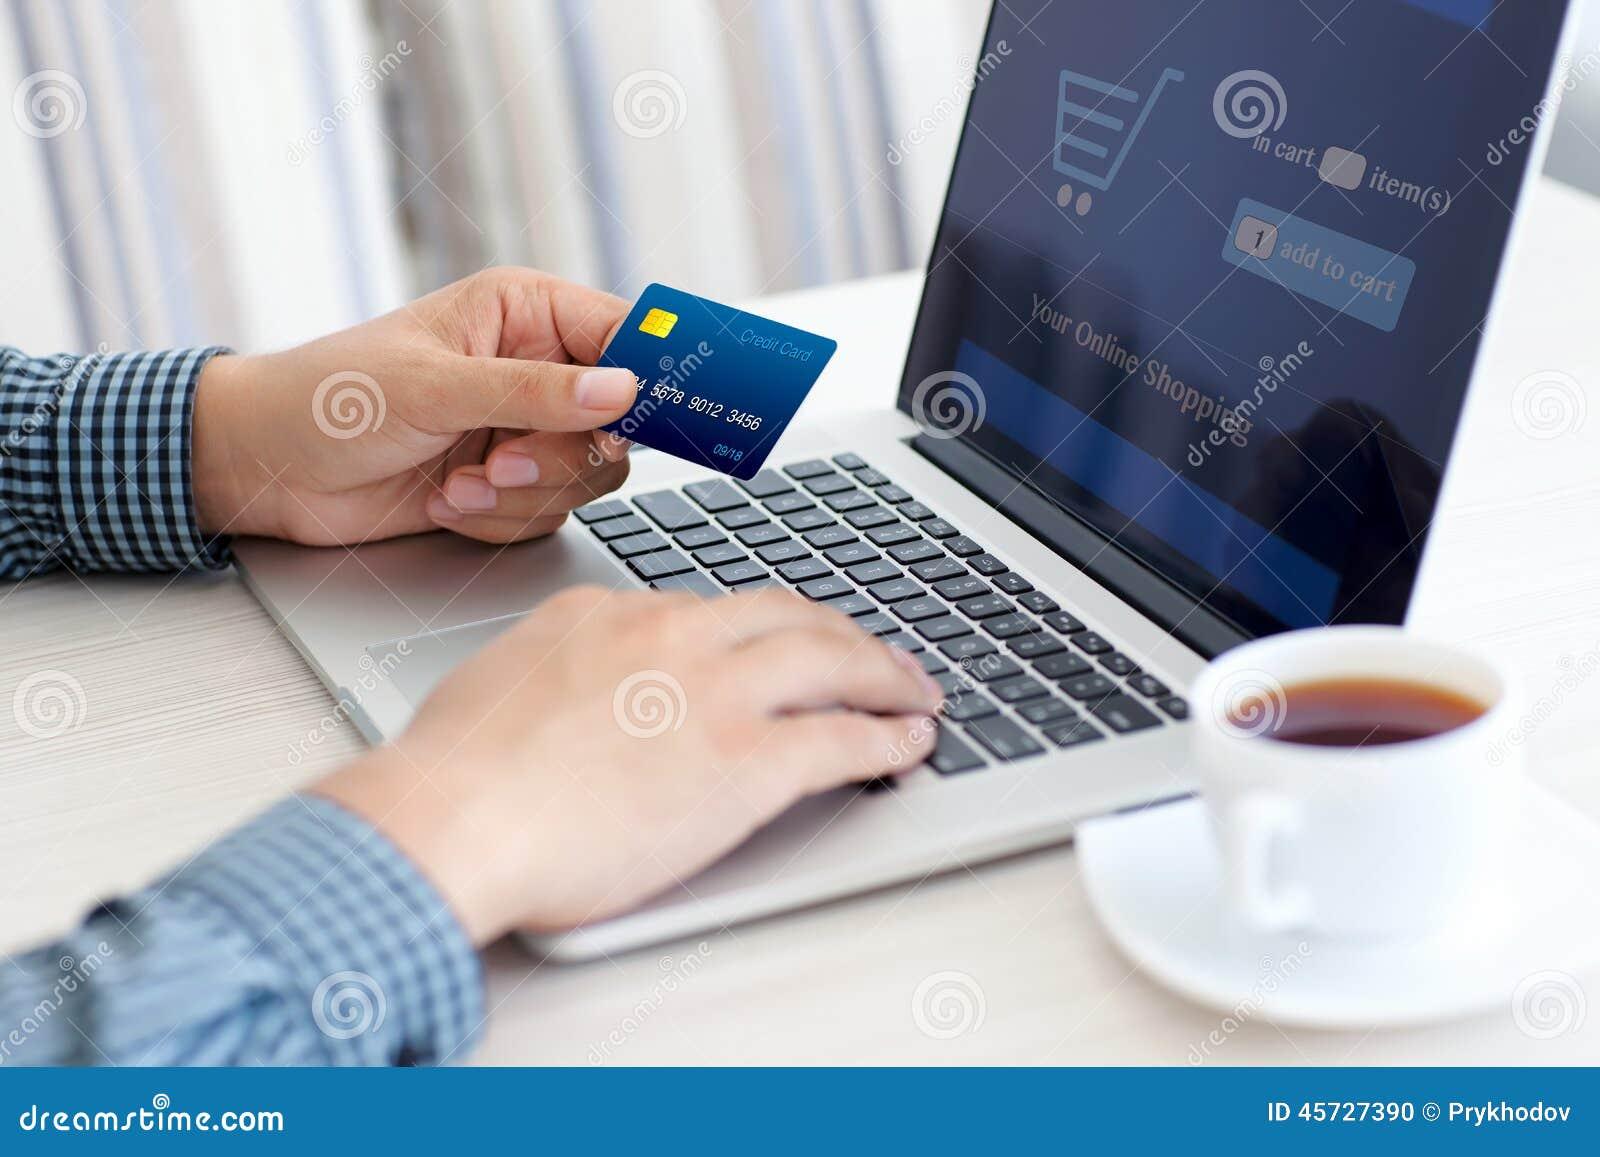 Comparison of online ticket sales software